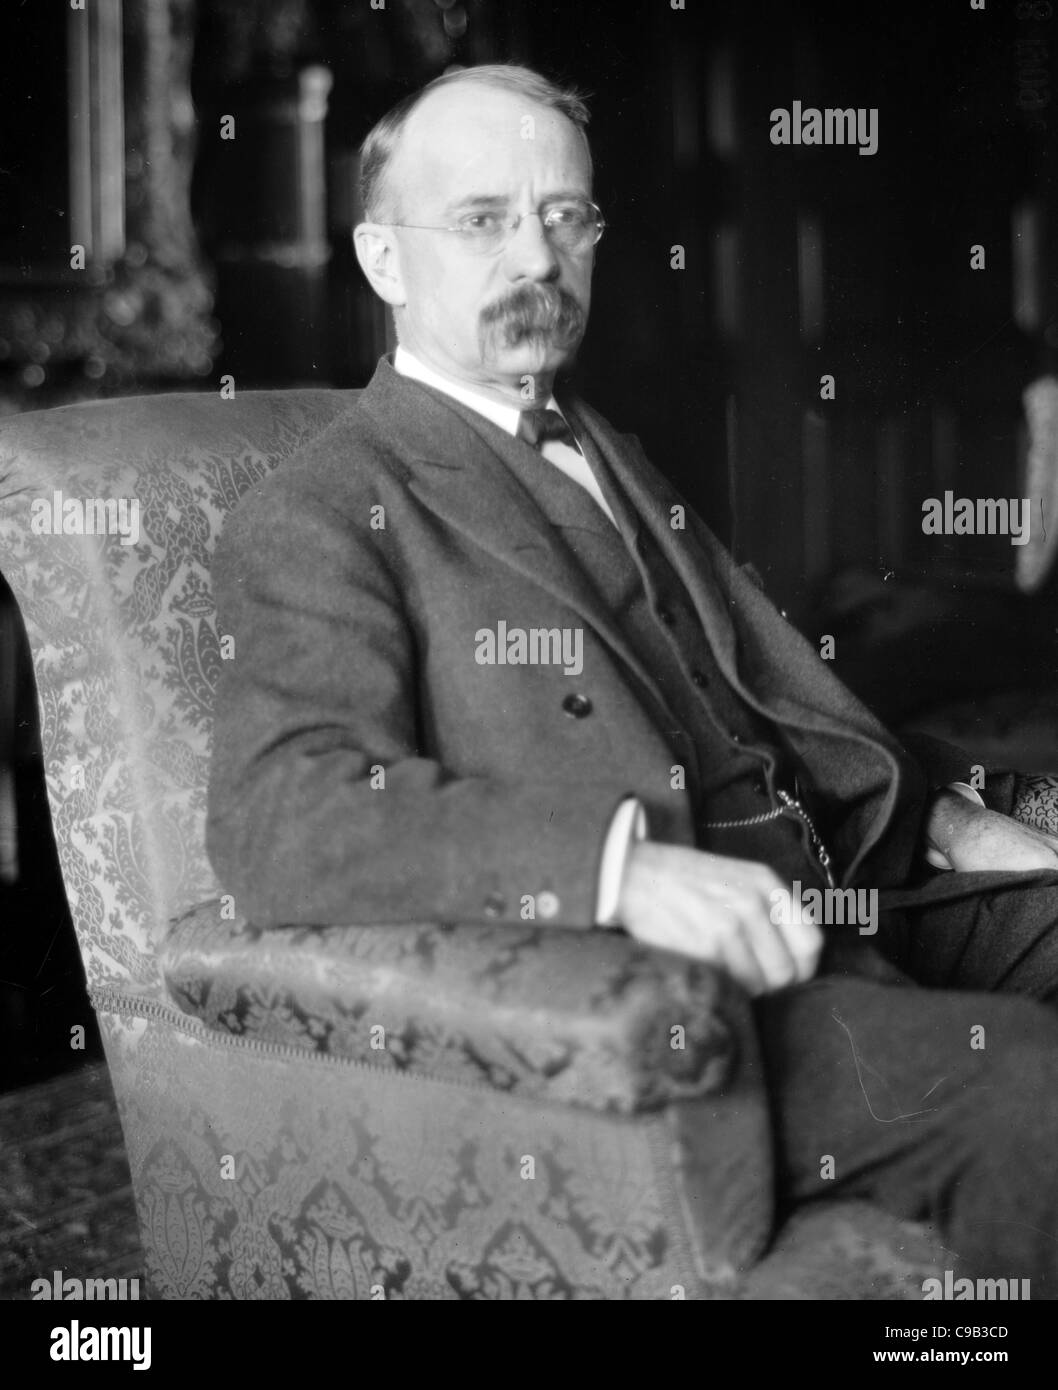 Edward Henry Harriman, American railroad executive. - Stock Image